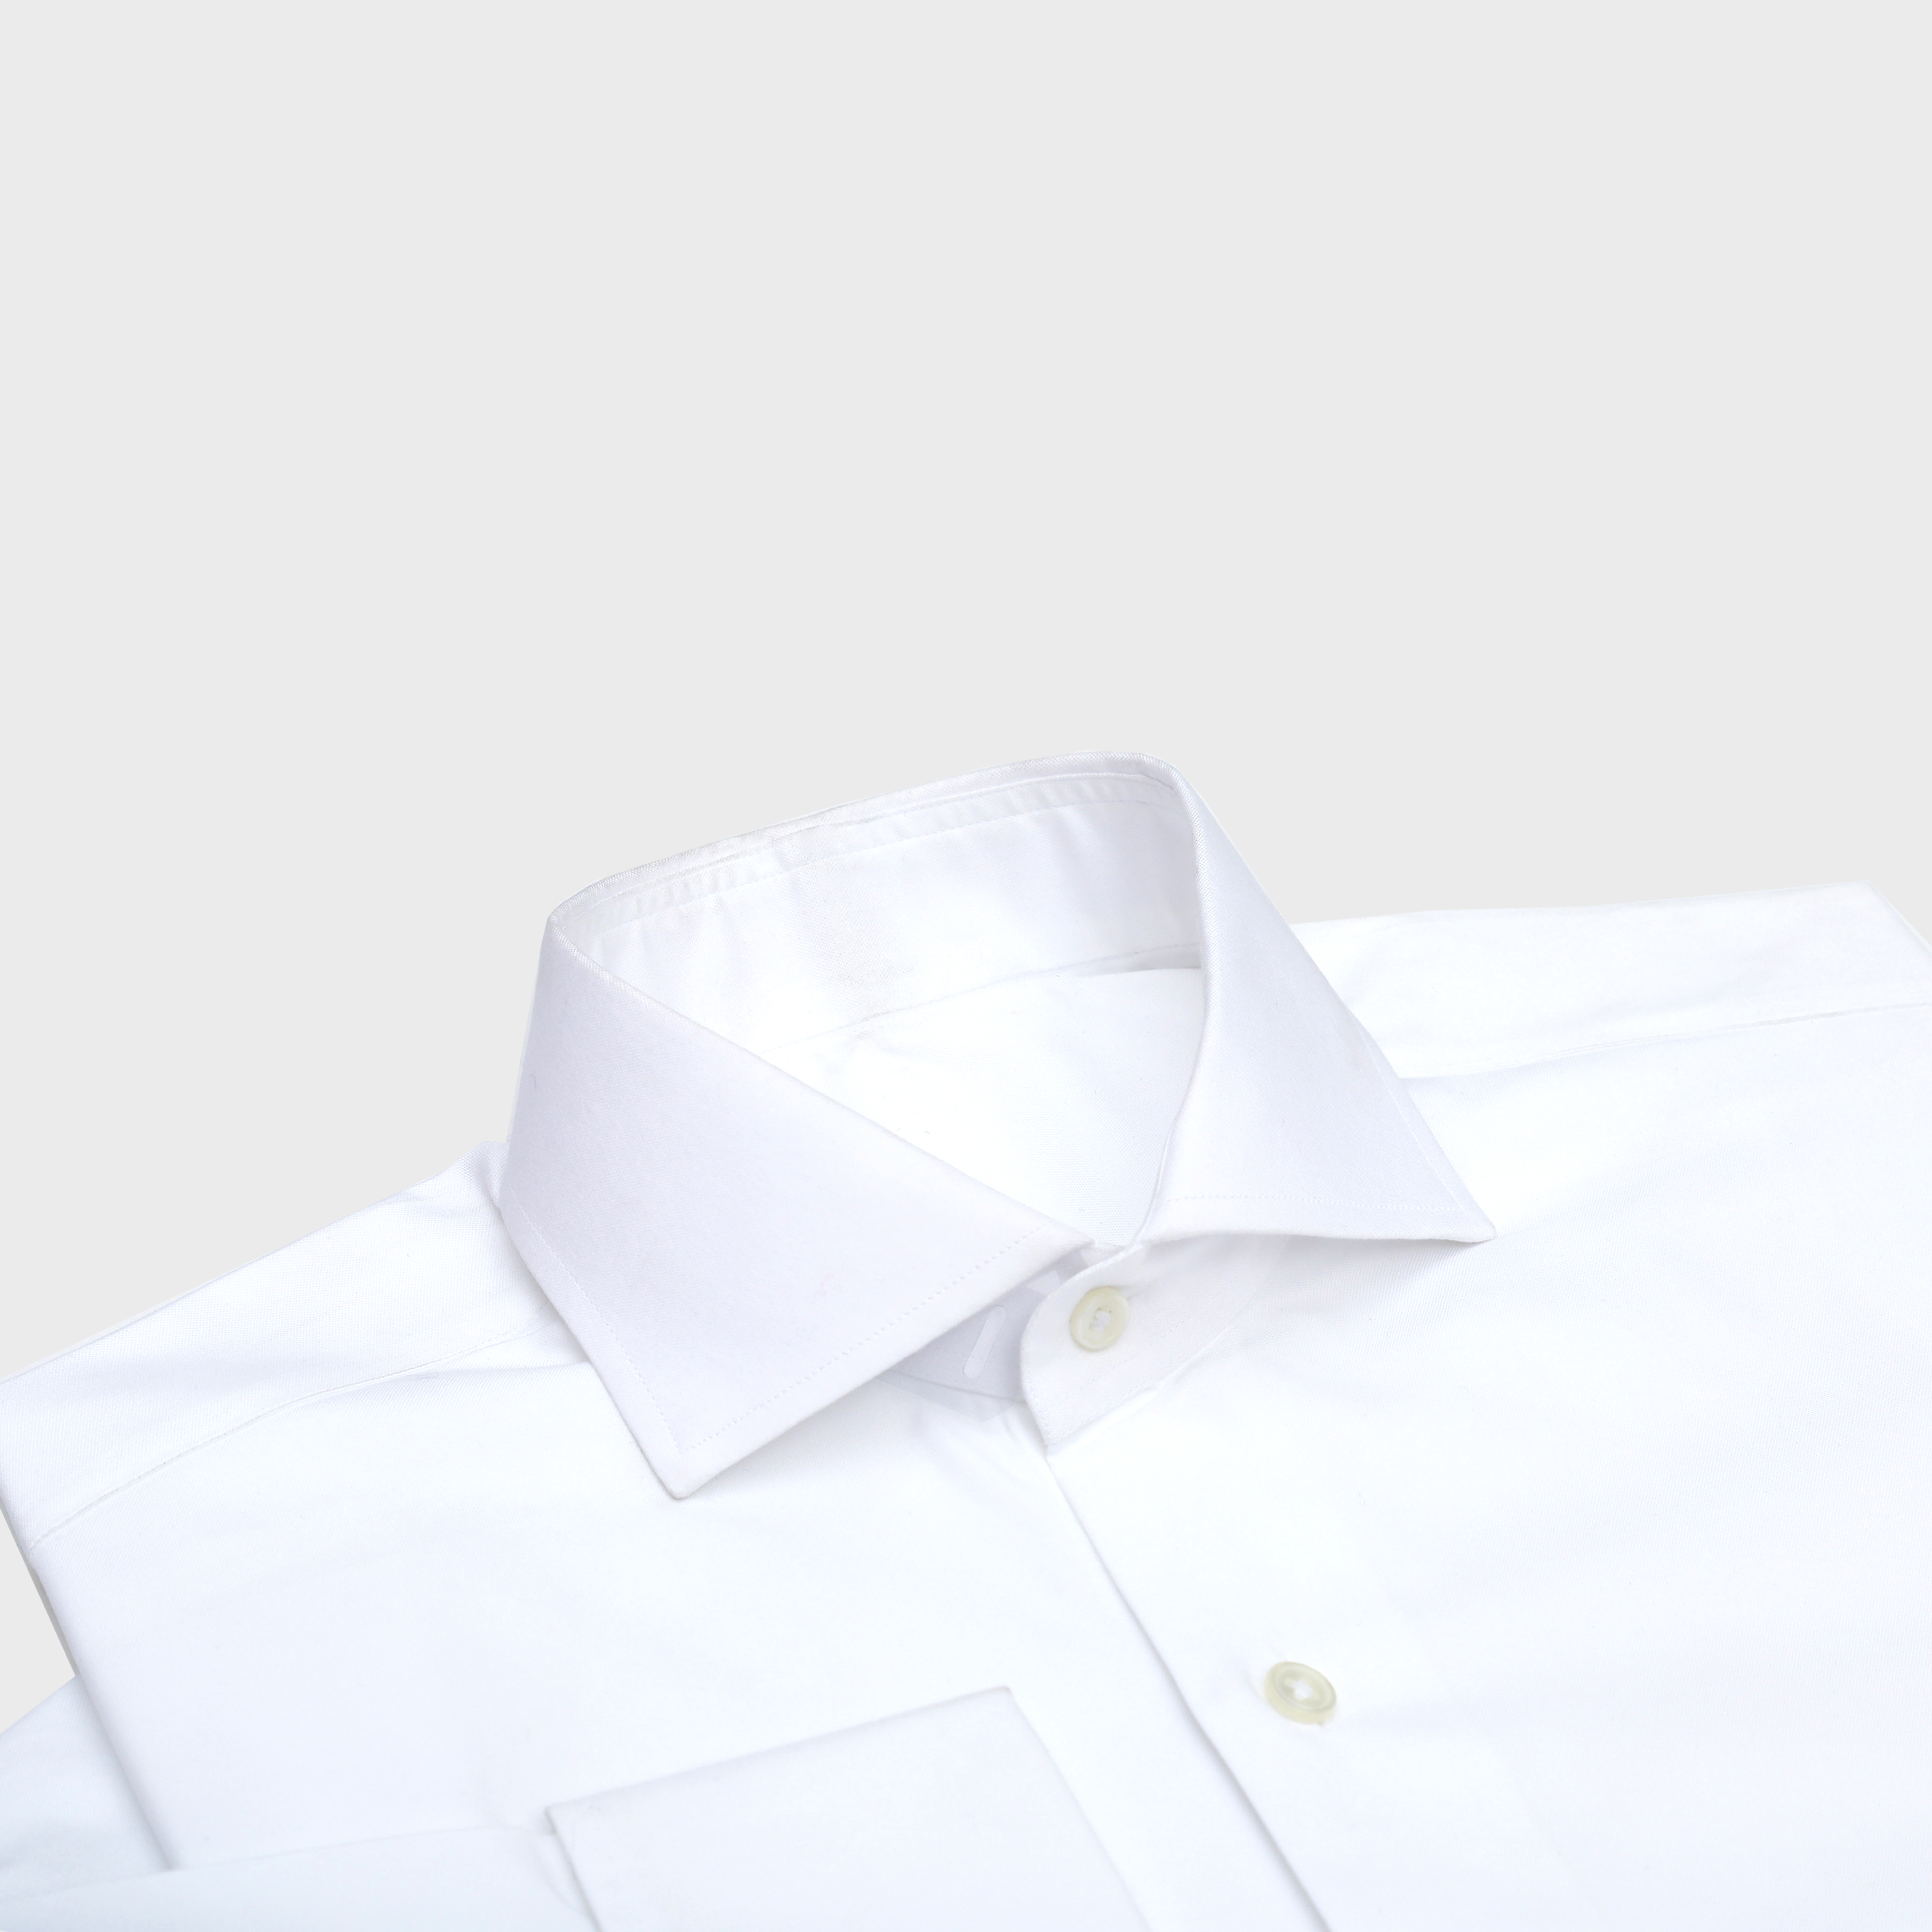 Sea Island Cotton Swanshirts